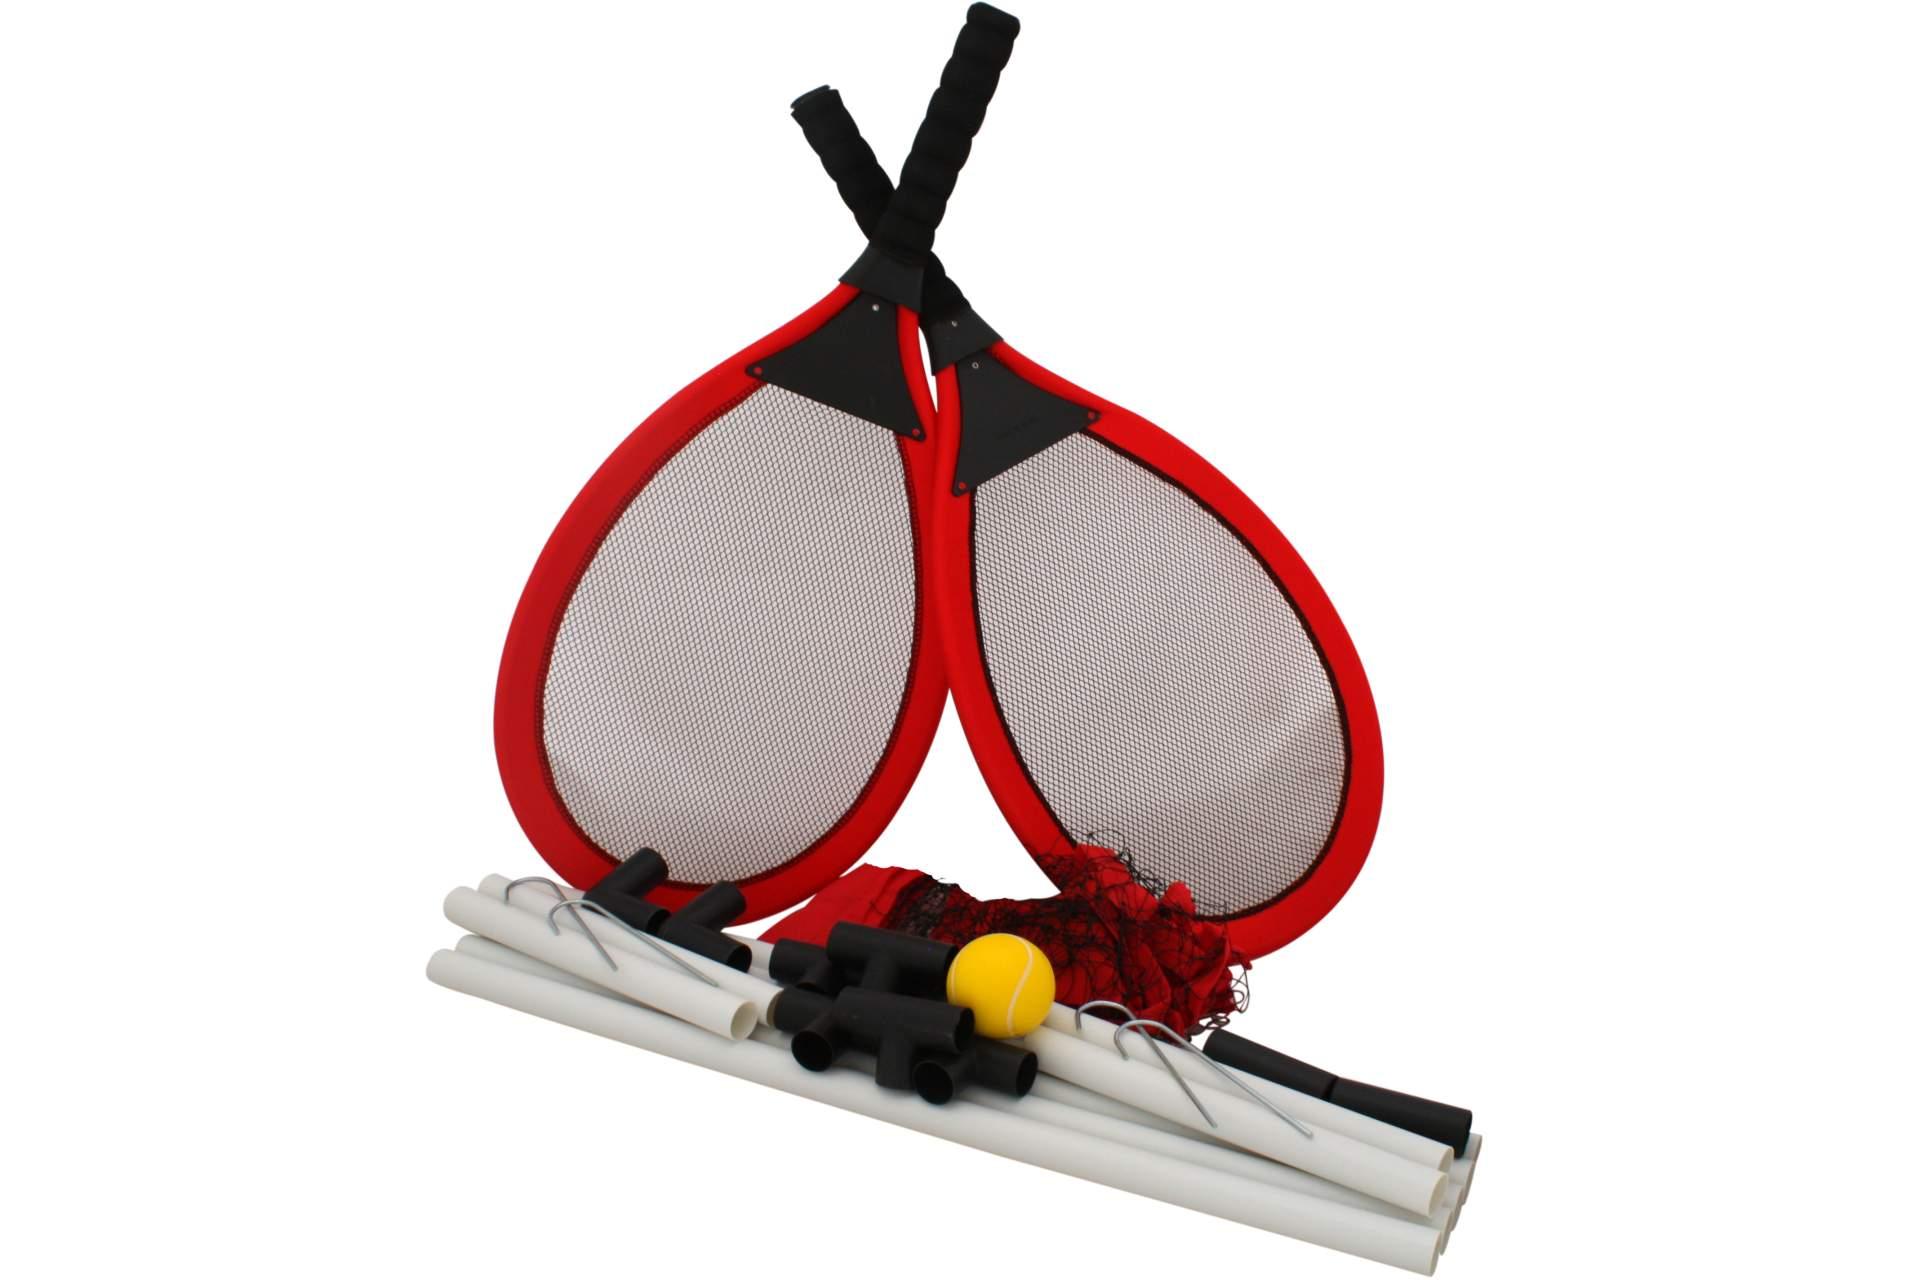 tennisspiel gartentennis f r 2 personen jumbo tennisschl ger spielzeug f r drau en. Black Bedroom Furniture Sets. Home Design Ideas